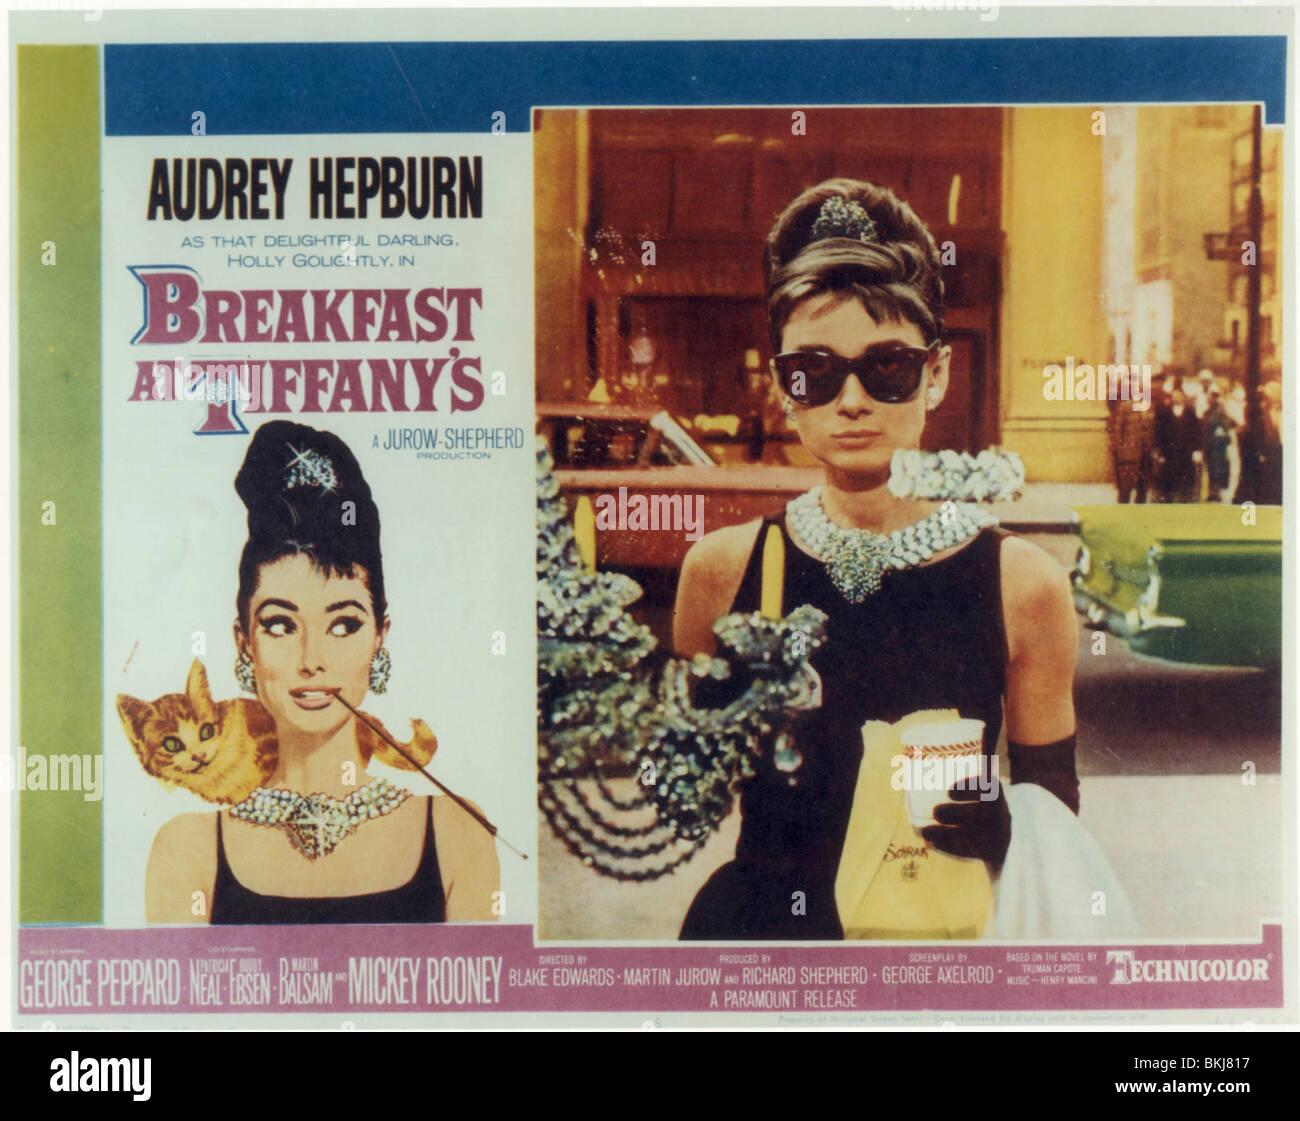 BREAKFAST AT TIFFANY'S (1961) AUDREY HEPBURN BRT 005CP - Stock Image